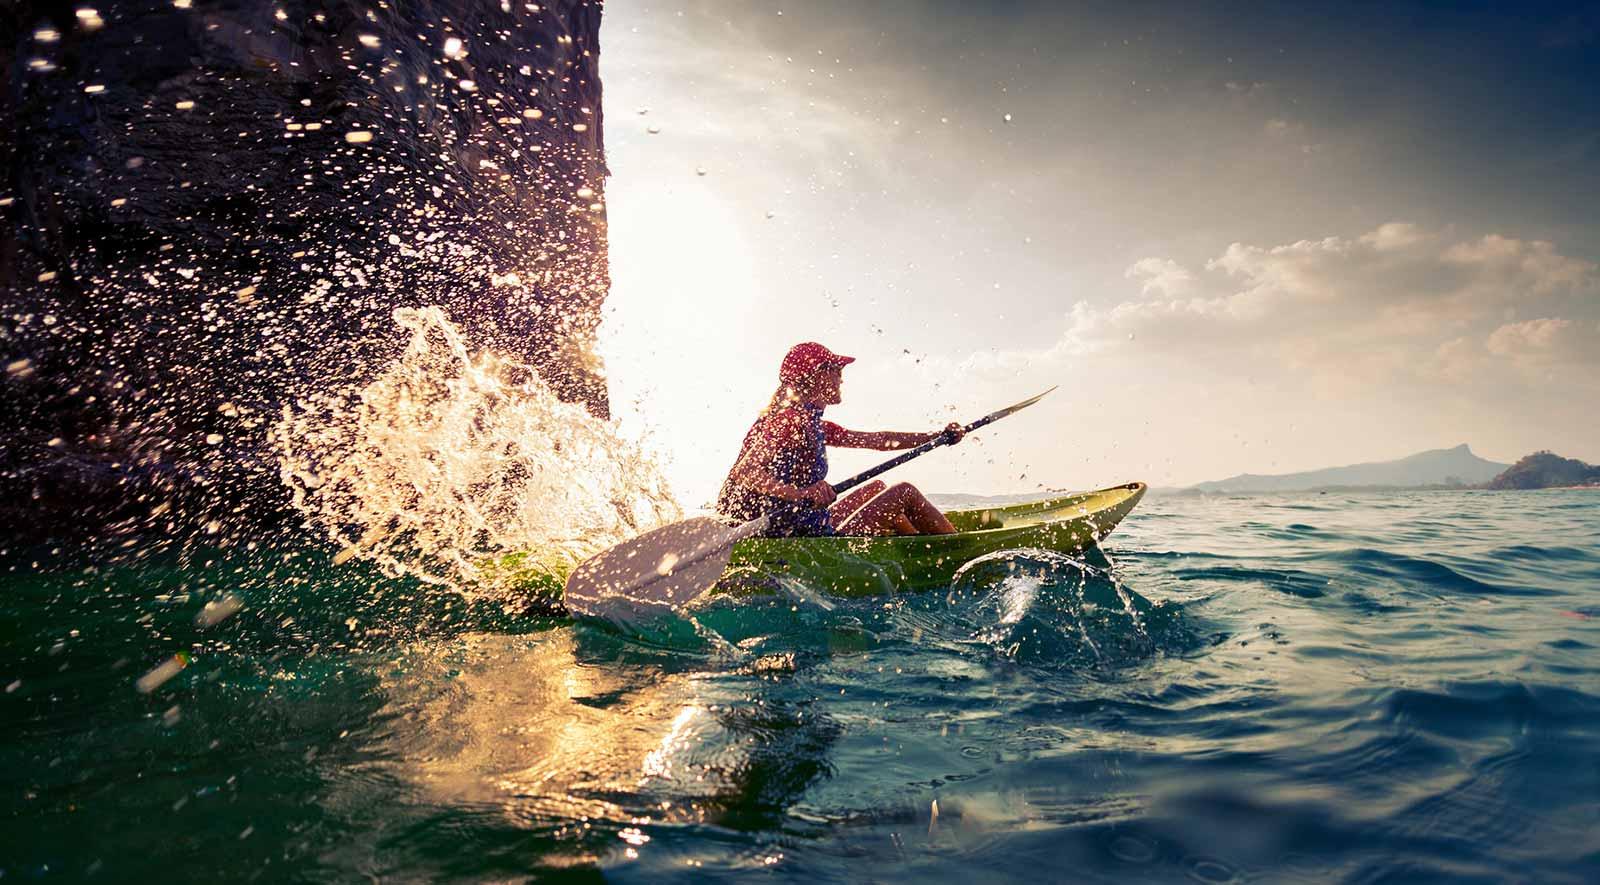 Kayak-Tour-Mallorca-Kayak-mieten-Mallorca-2